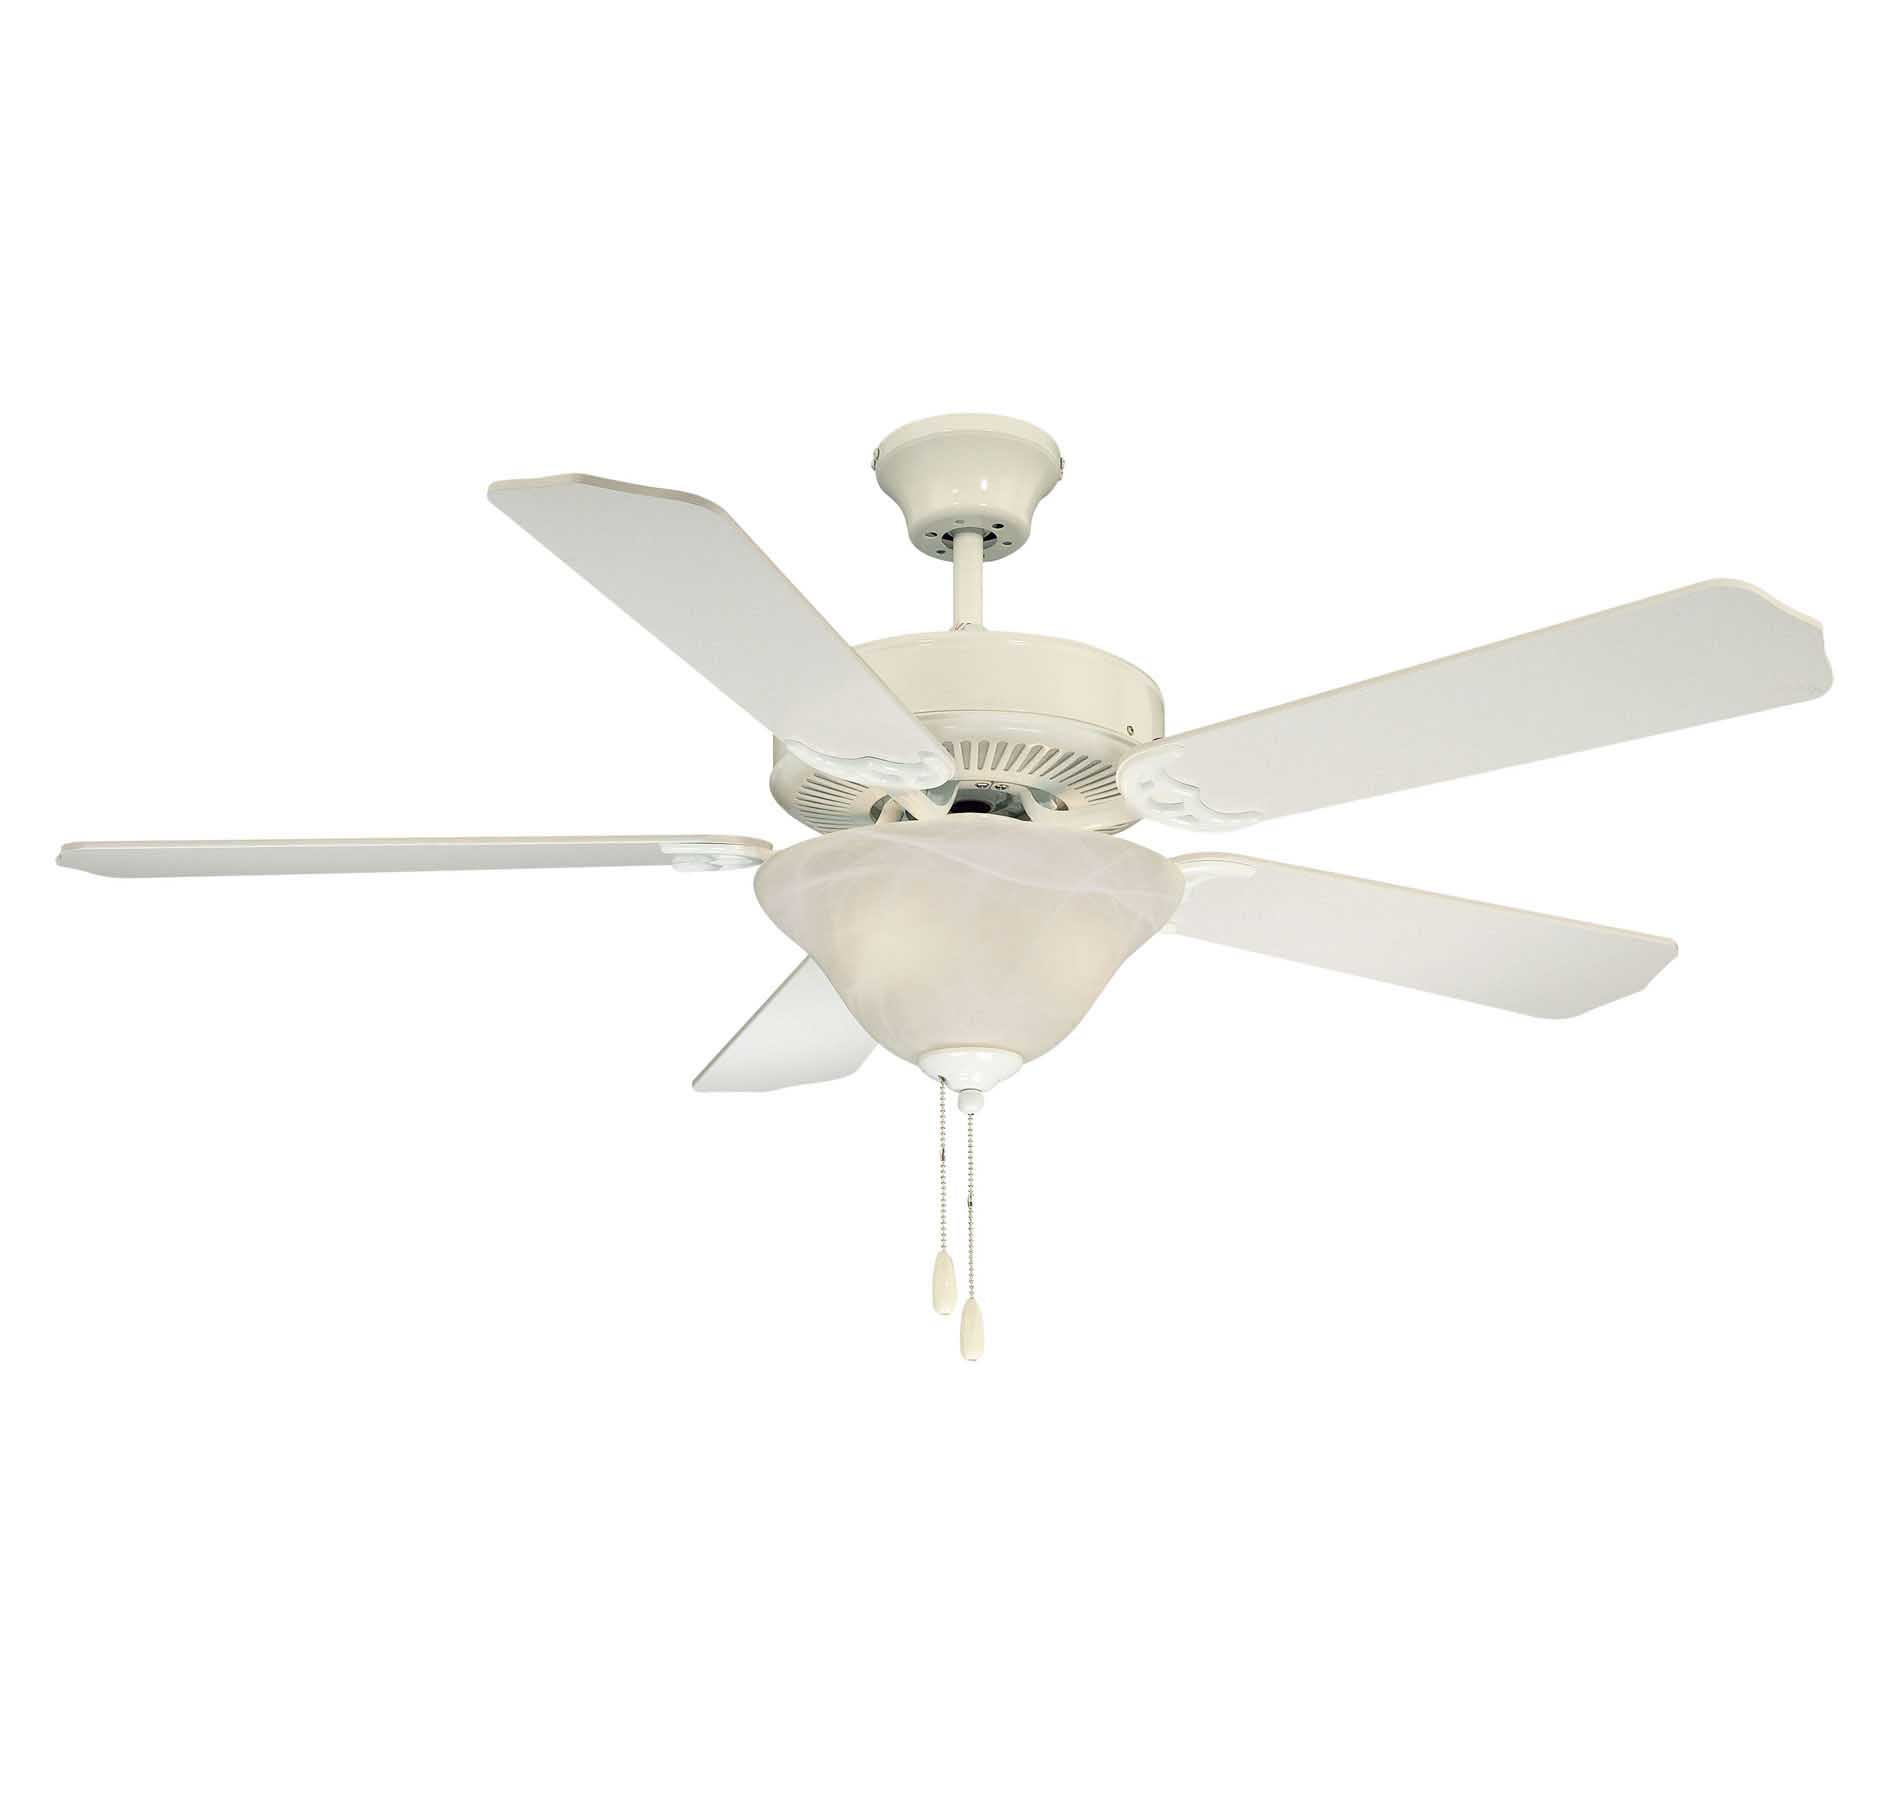 First value ecm ceiling fan by savoy house 52 ecm 5rv wh first value ecm ceiling fan by savoy house aloadofball Gallery